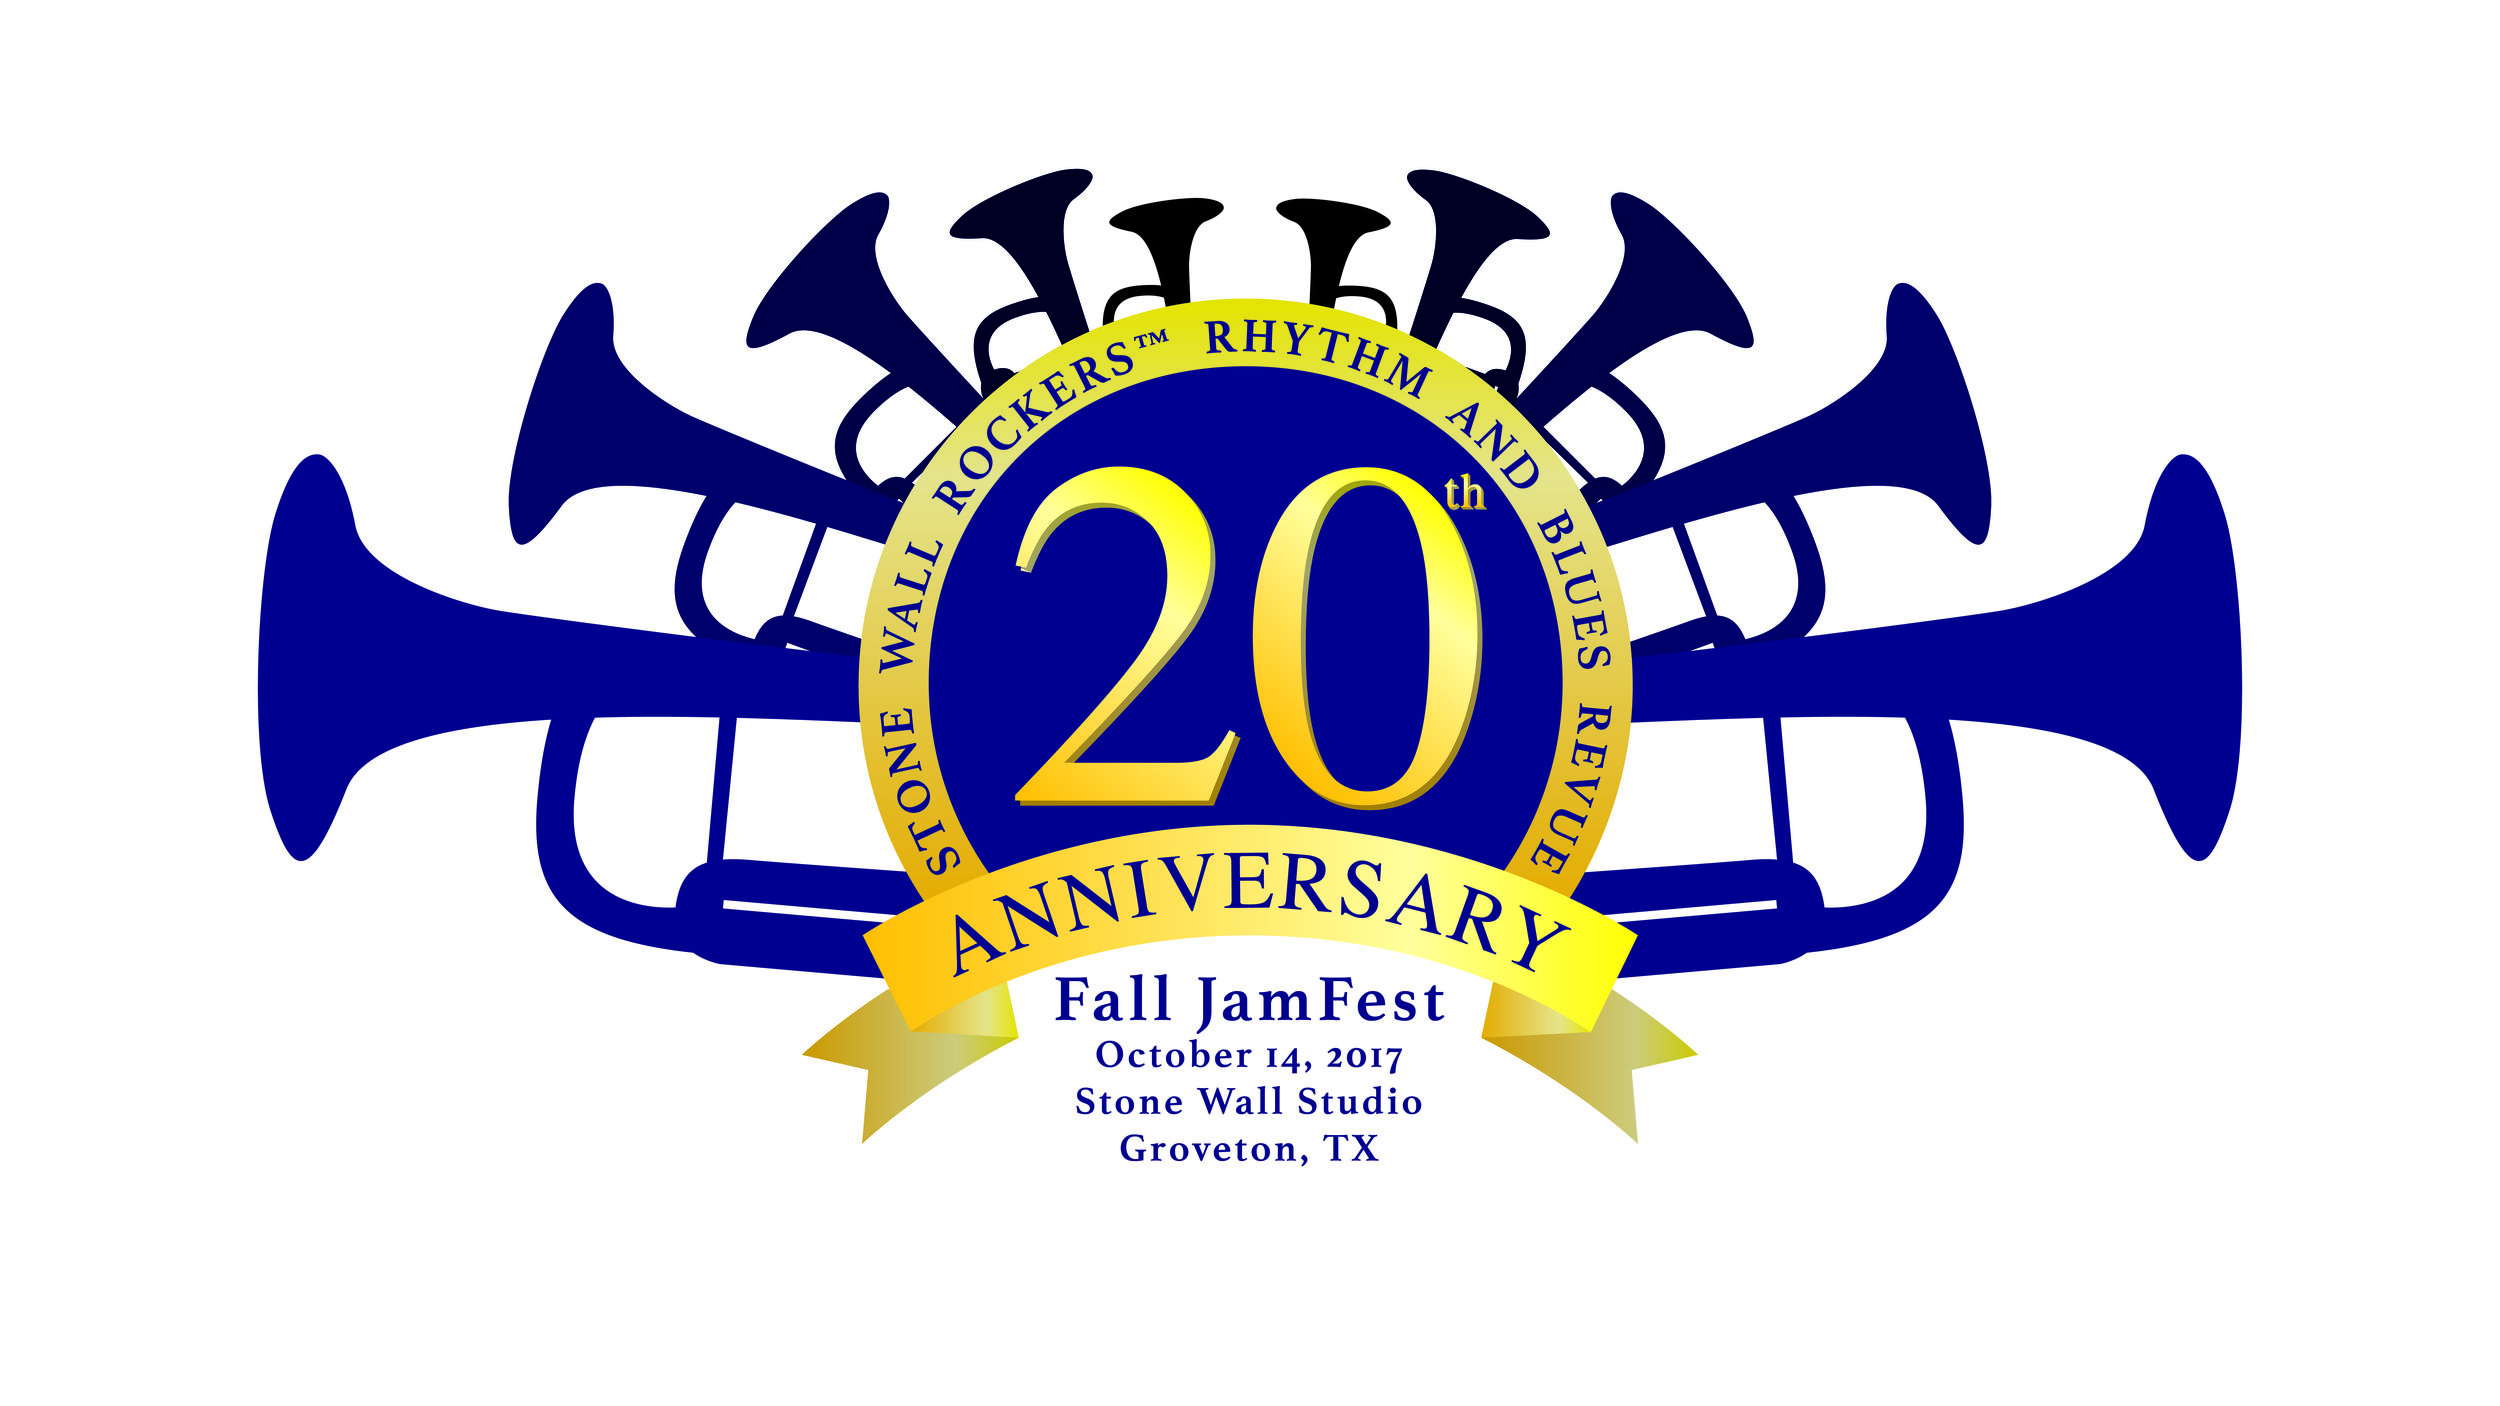 Anniversary Festival